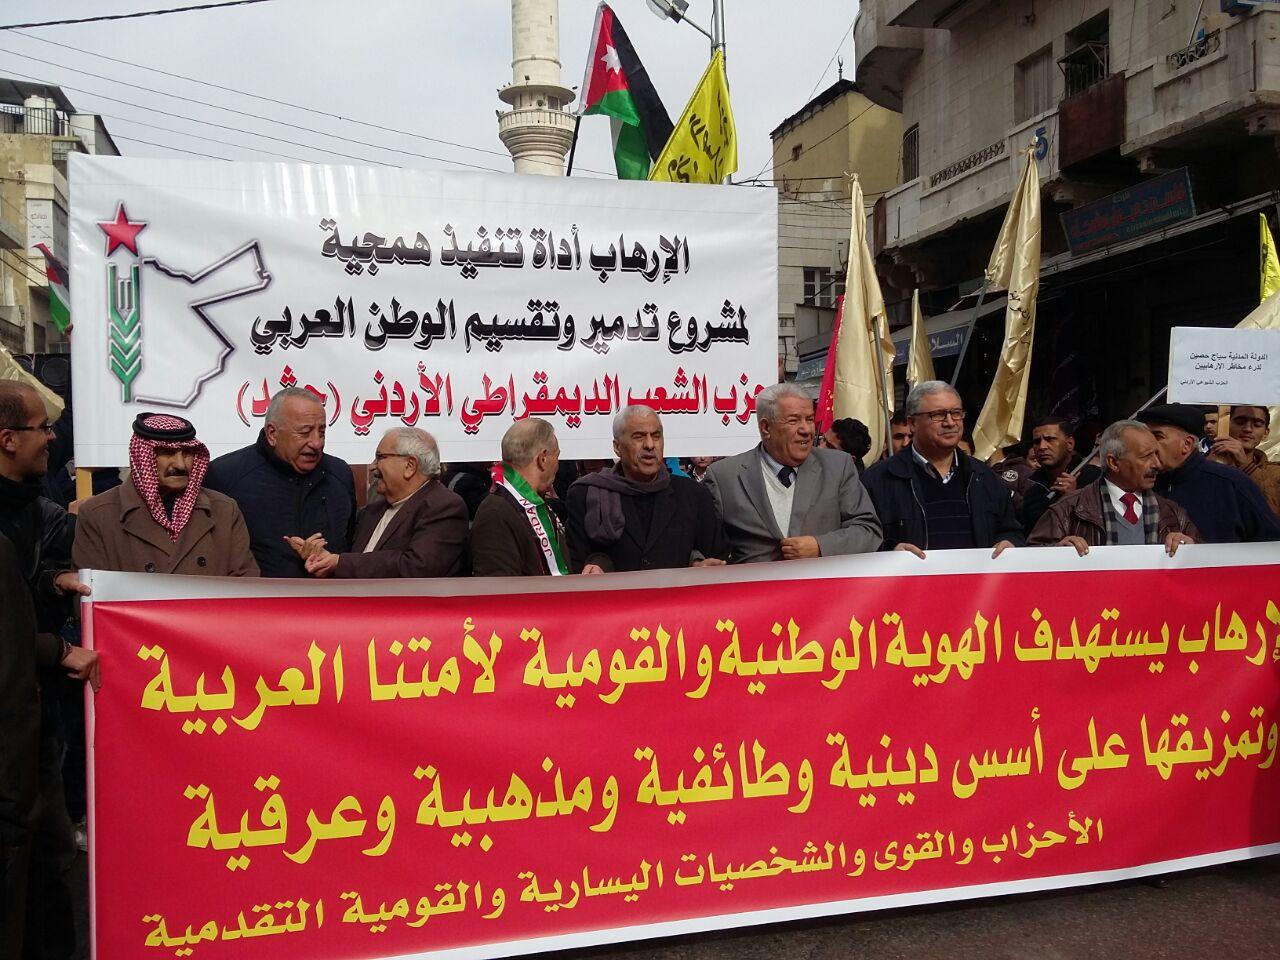 مسيرات تتضامن مع الوطن وتندد بالإرهاب - صور